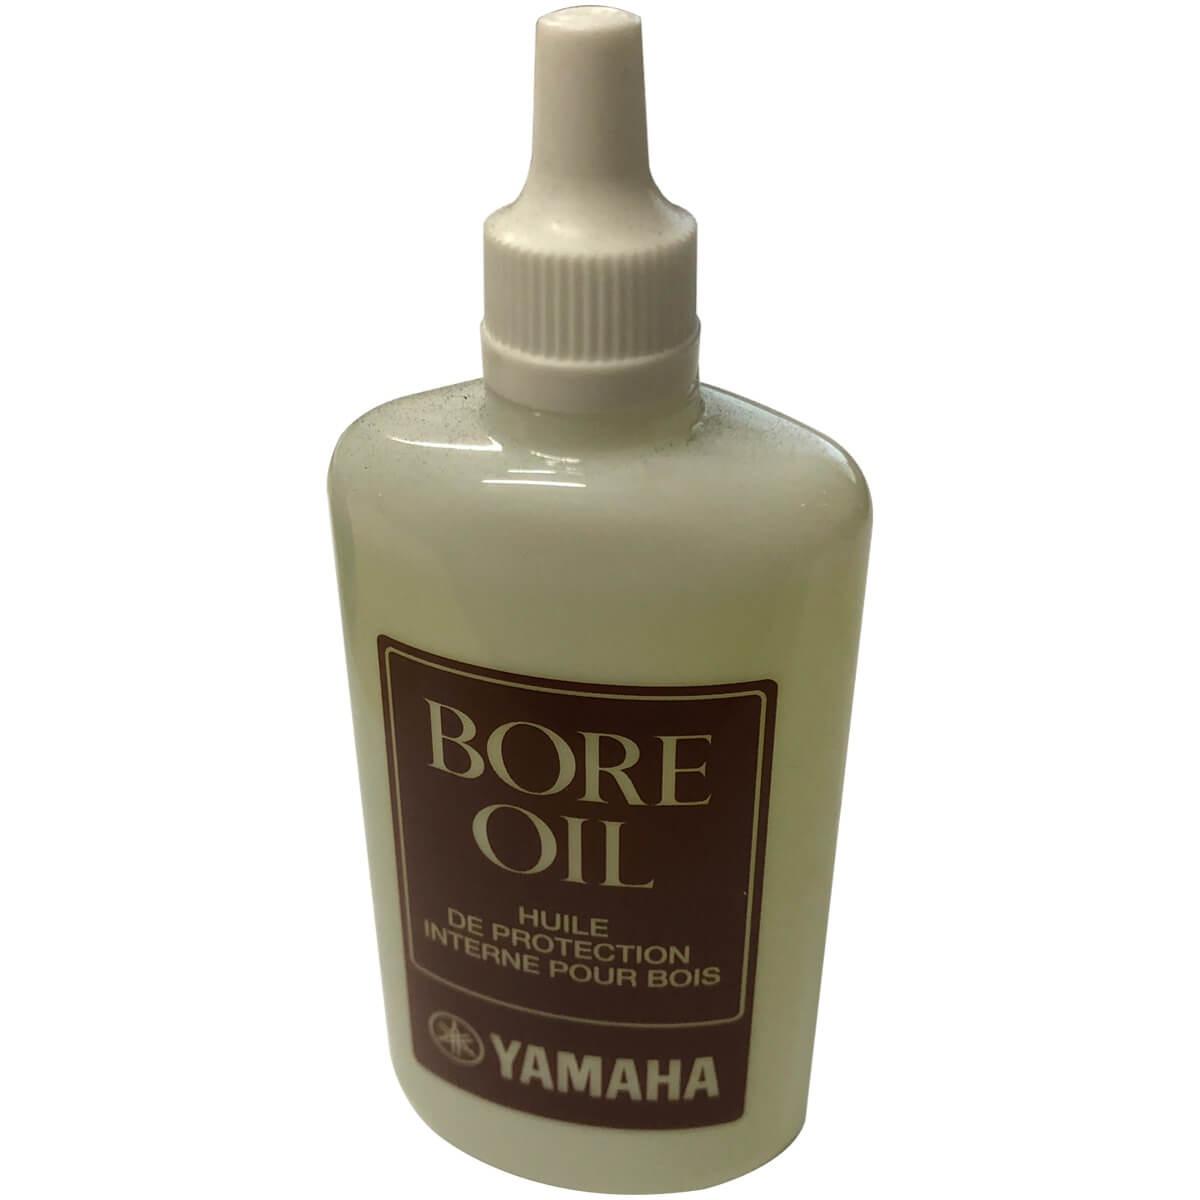 Óleo Hidratante Bore Oil Yamaha para Instrumentos de Sopros de Madeira Made in Japan